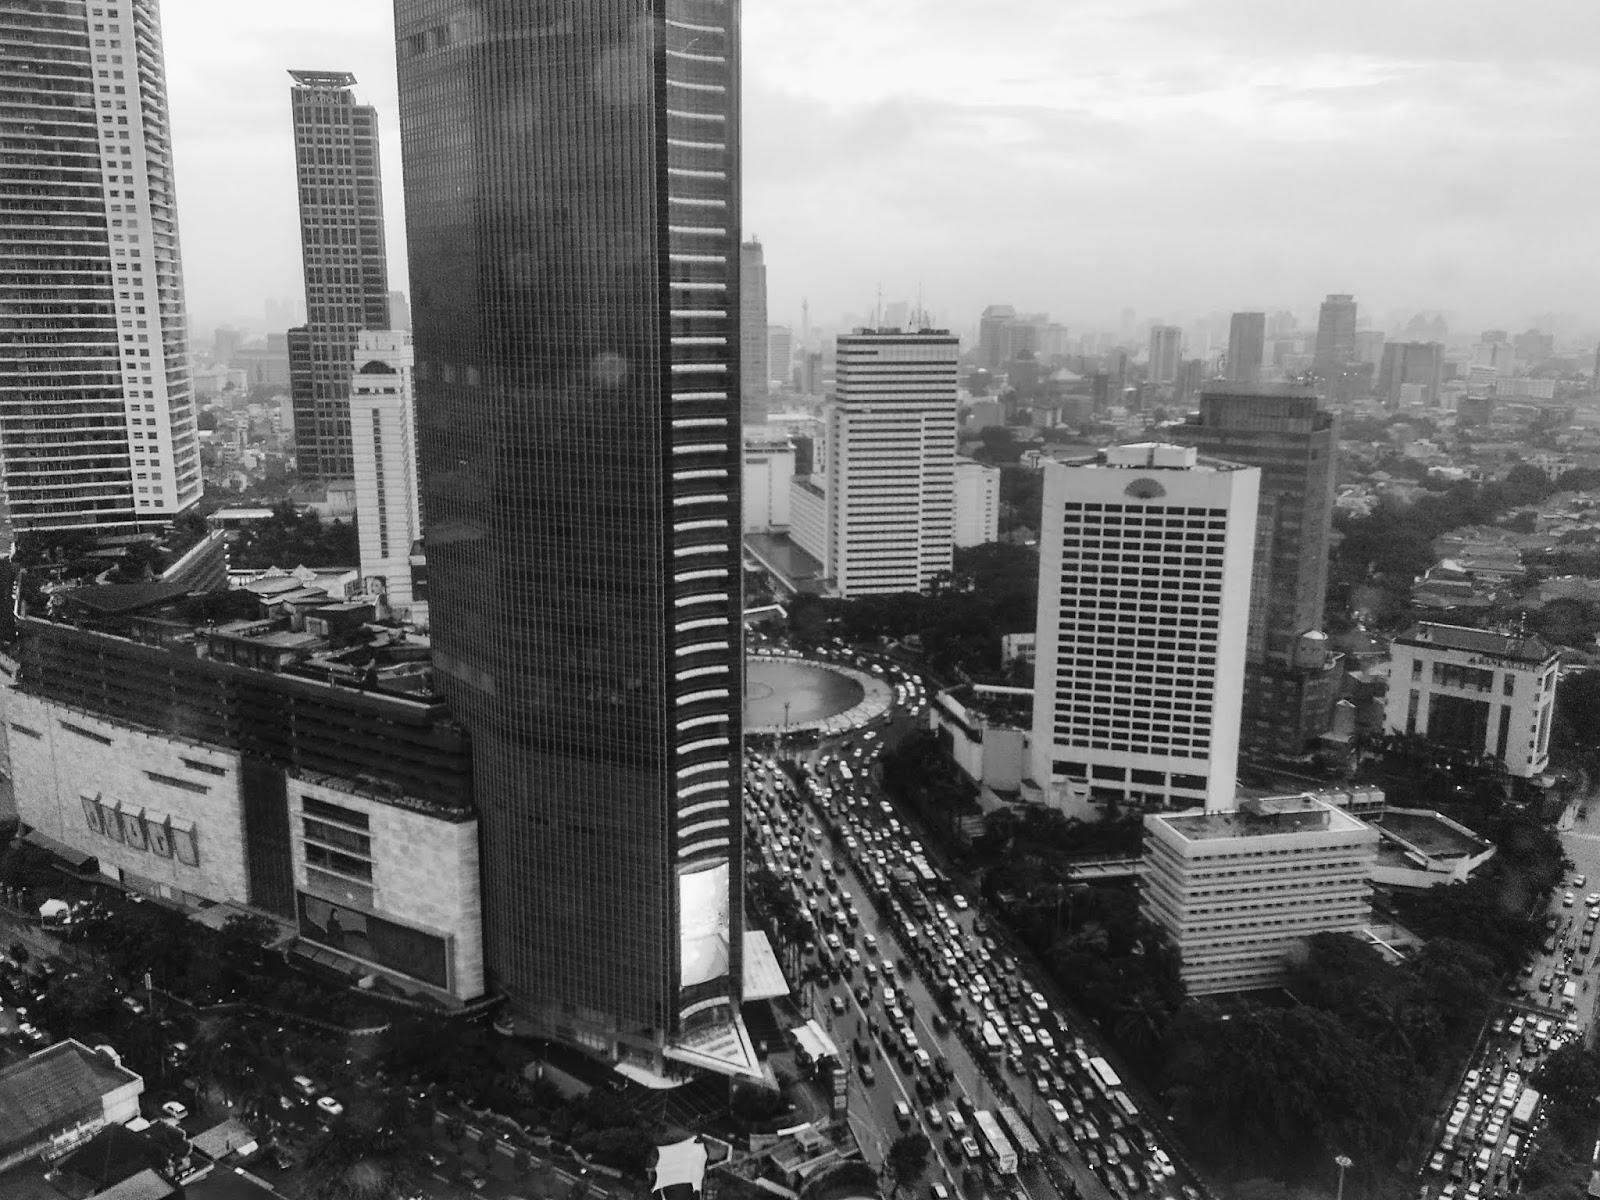 JAKARTA'S TRAFFIC JAM